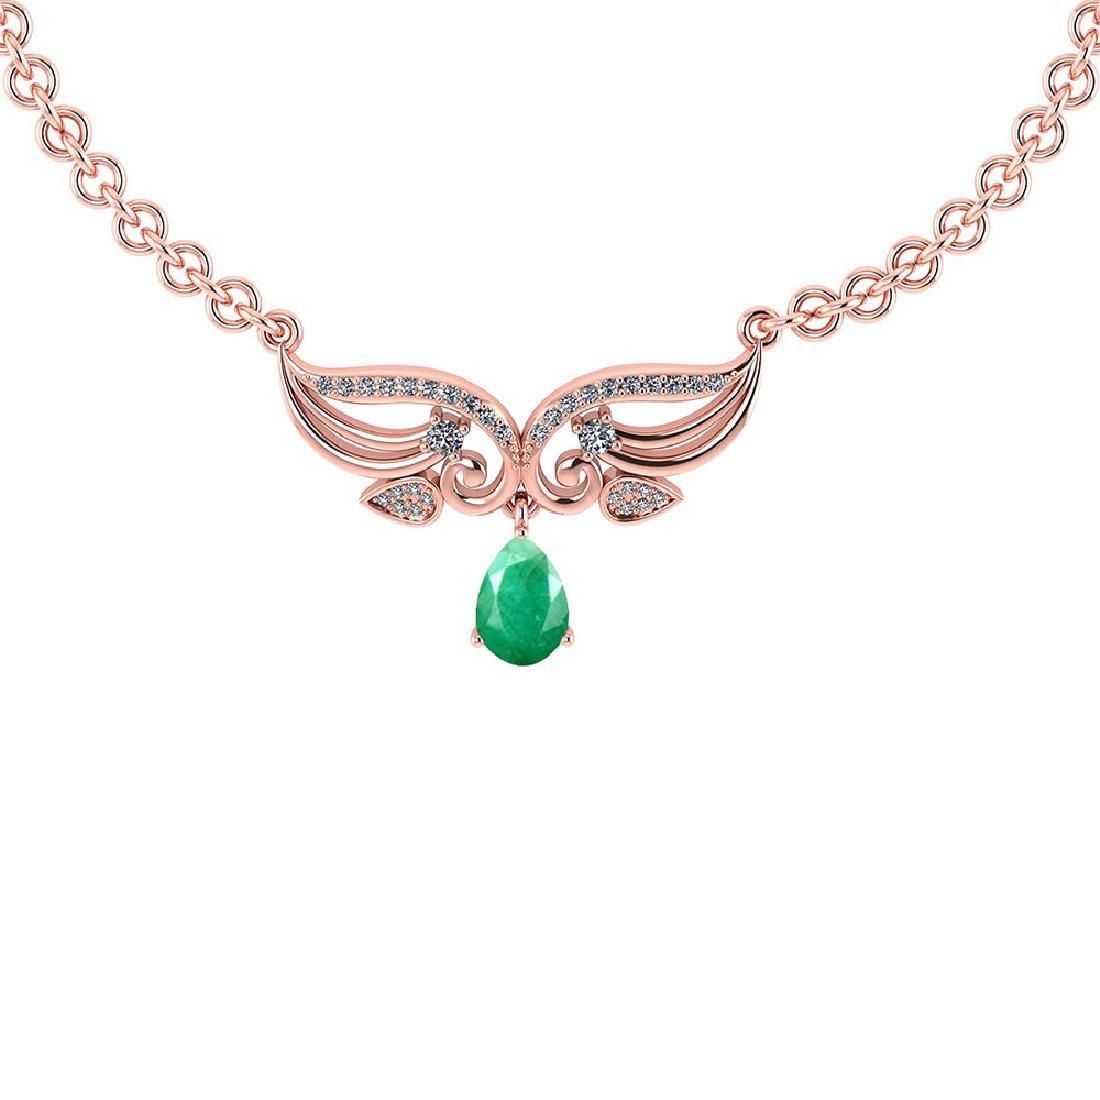 Certified 3.94 CTW Genuine Emerald And Diamond 14k Rose